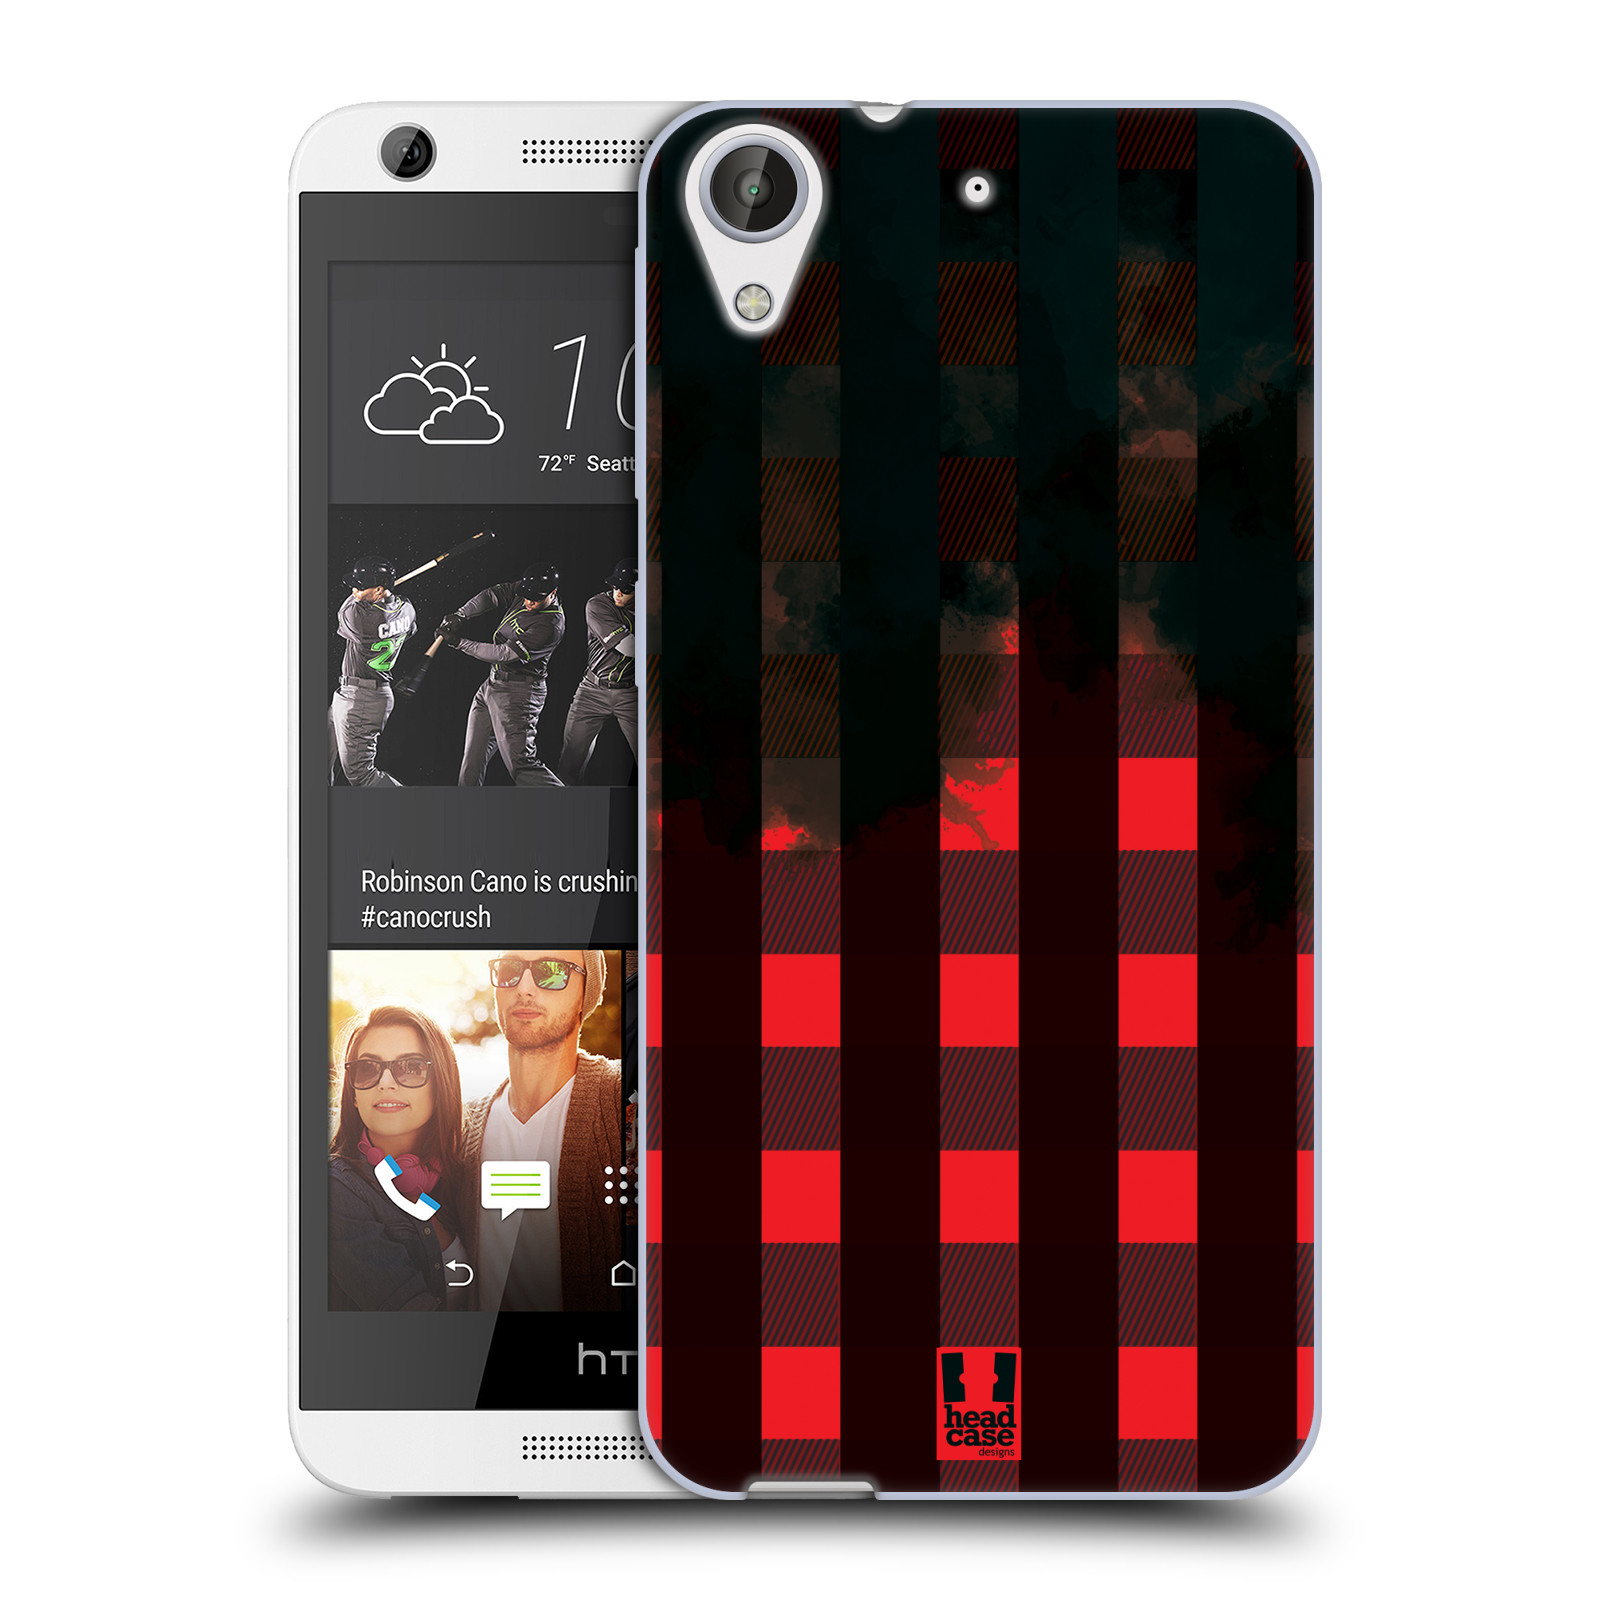 Silikonové pouzdro na mobil HTC Desire 626 / 626G HEAD CASE FLANEL RED BLACK (Silikonový kryt či obal na mobilní telefon HTC Desire 626 a 626G Dual SIM)